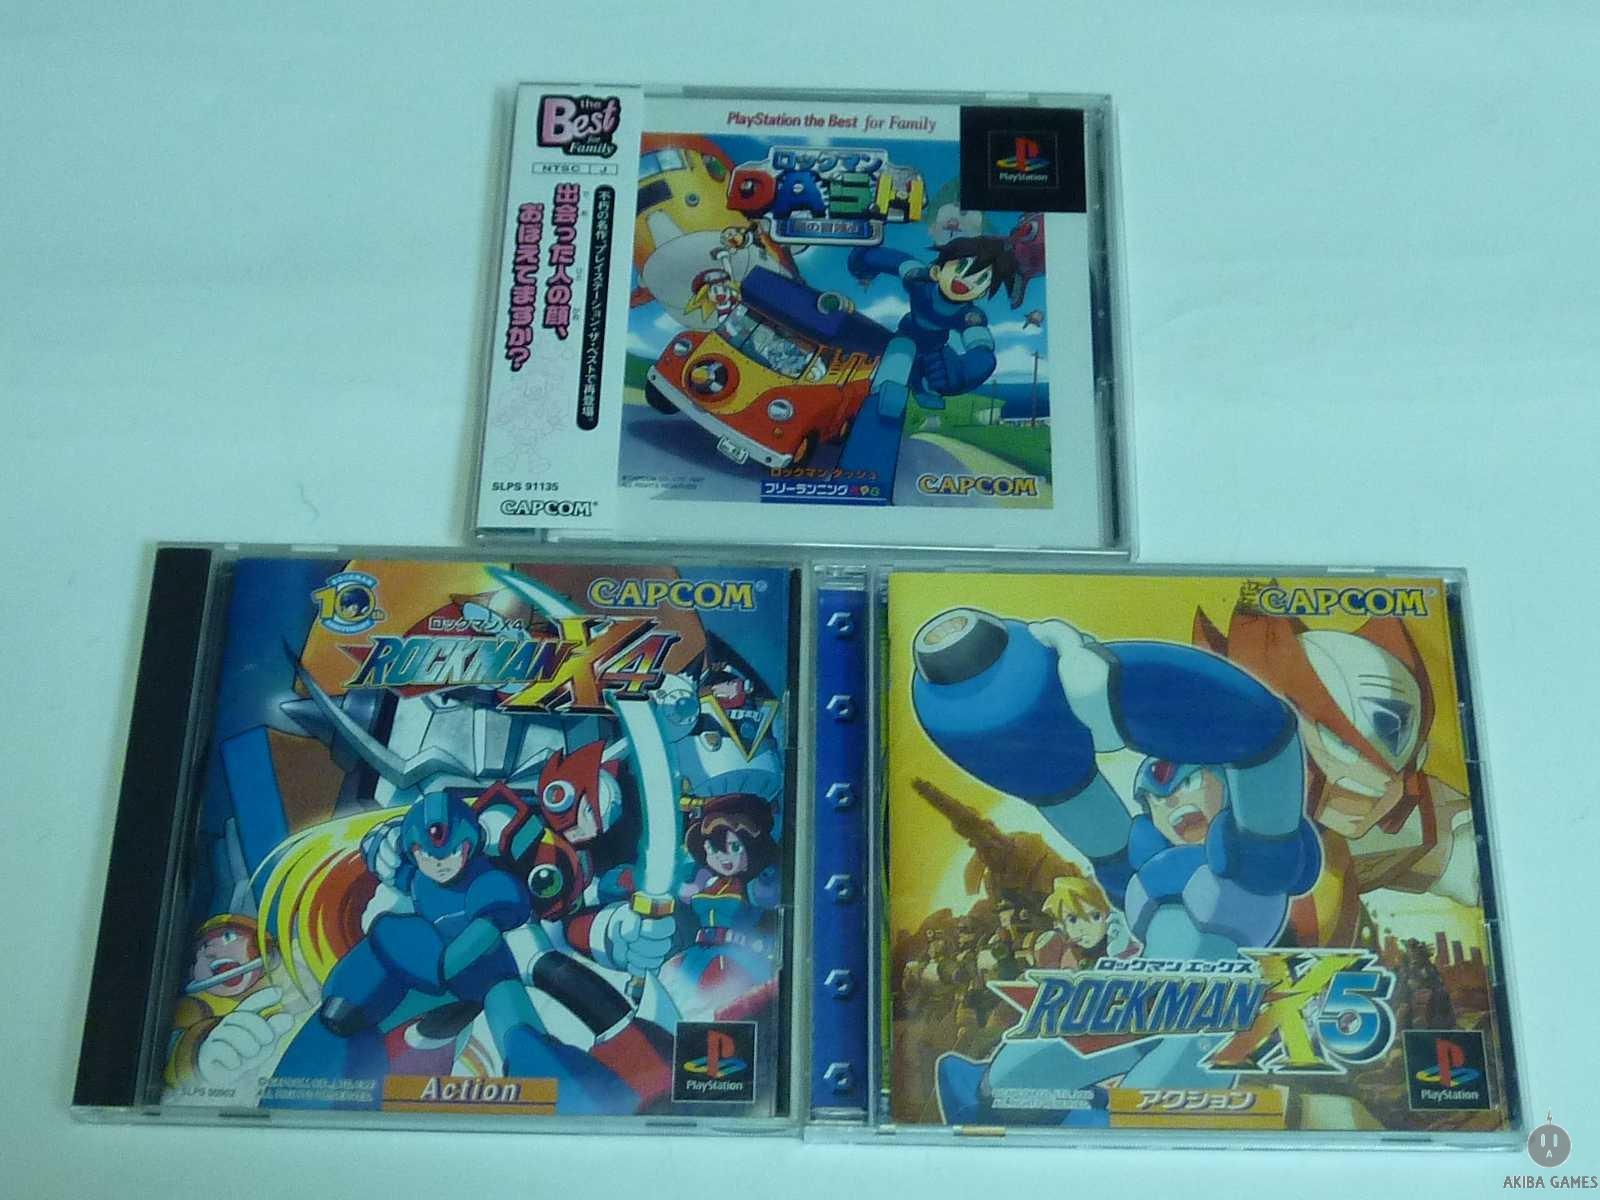 [PS] Playstation the Best for Family - Rockman Dash - Mega Man Legends+X4+X5 Set